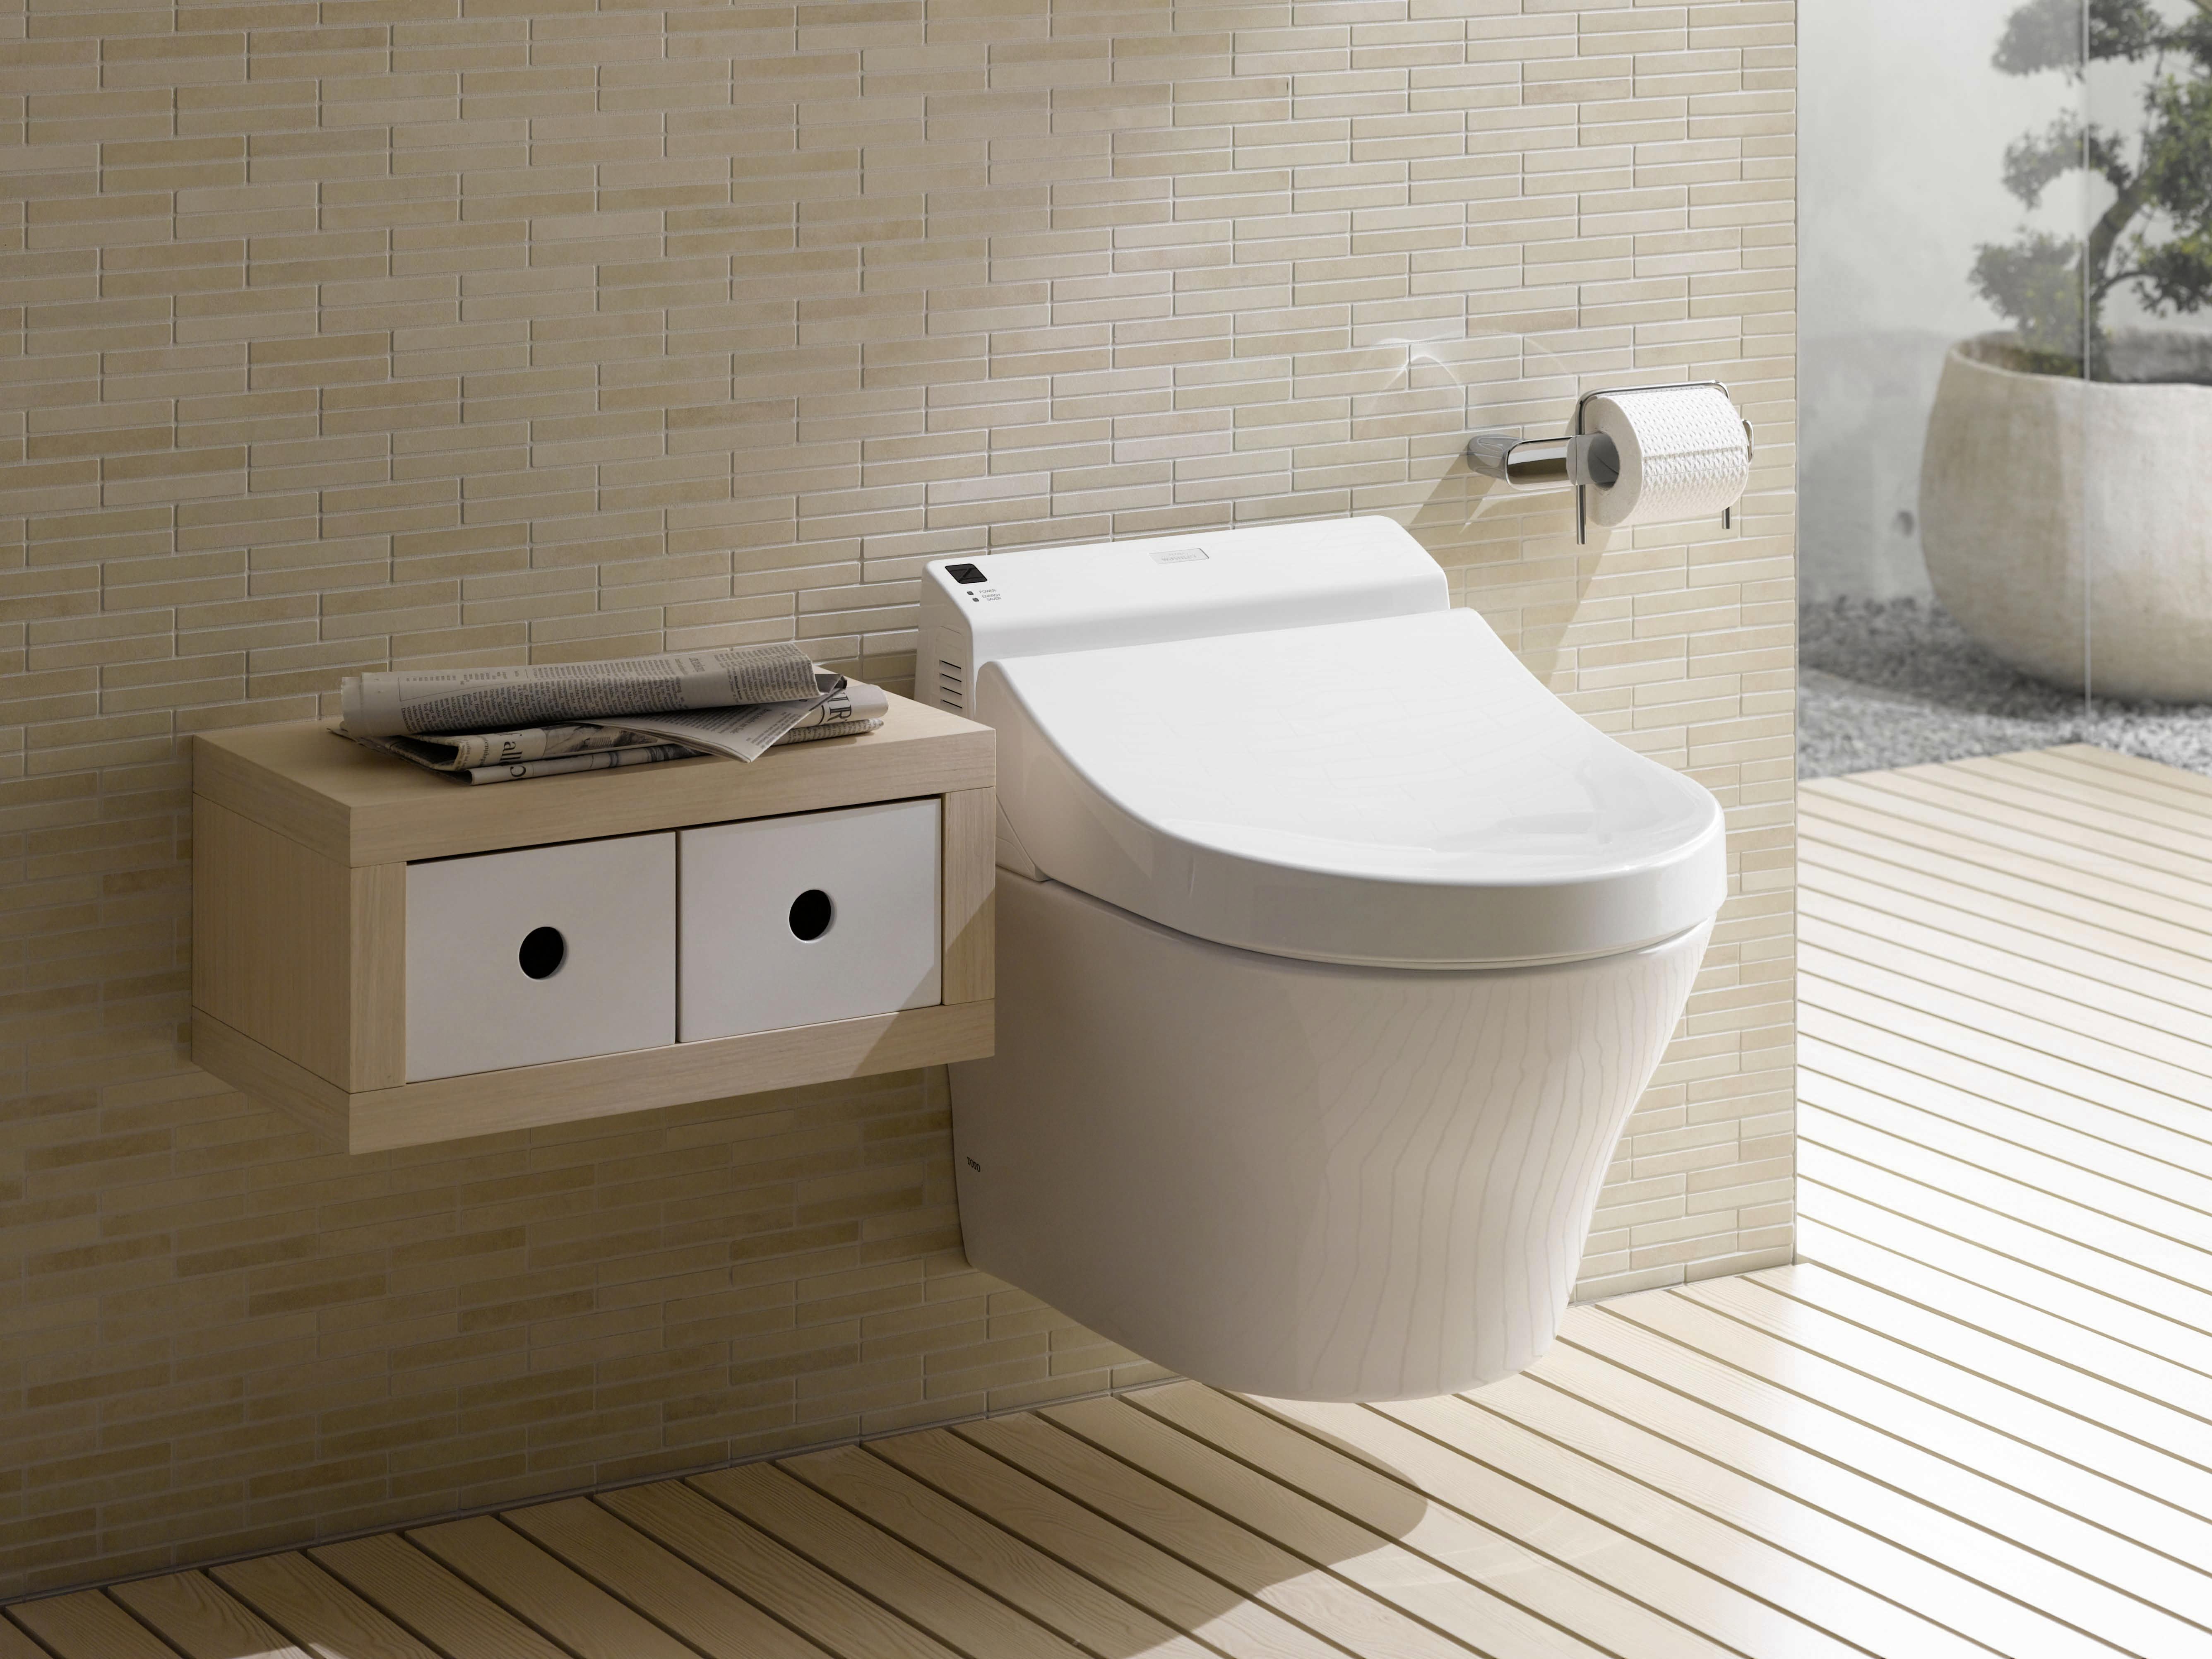 Toto WC | WCs/Bidets/Urinale | Pinterest